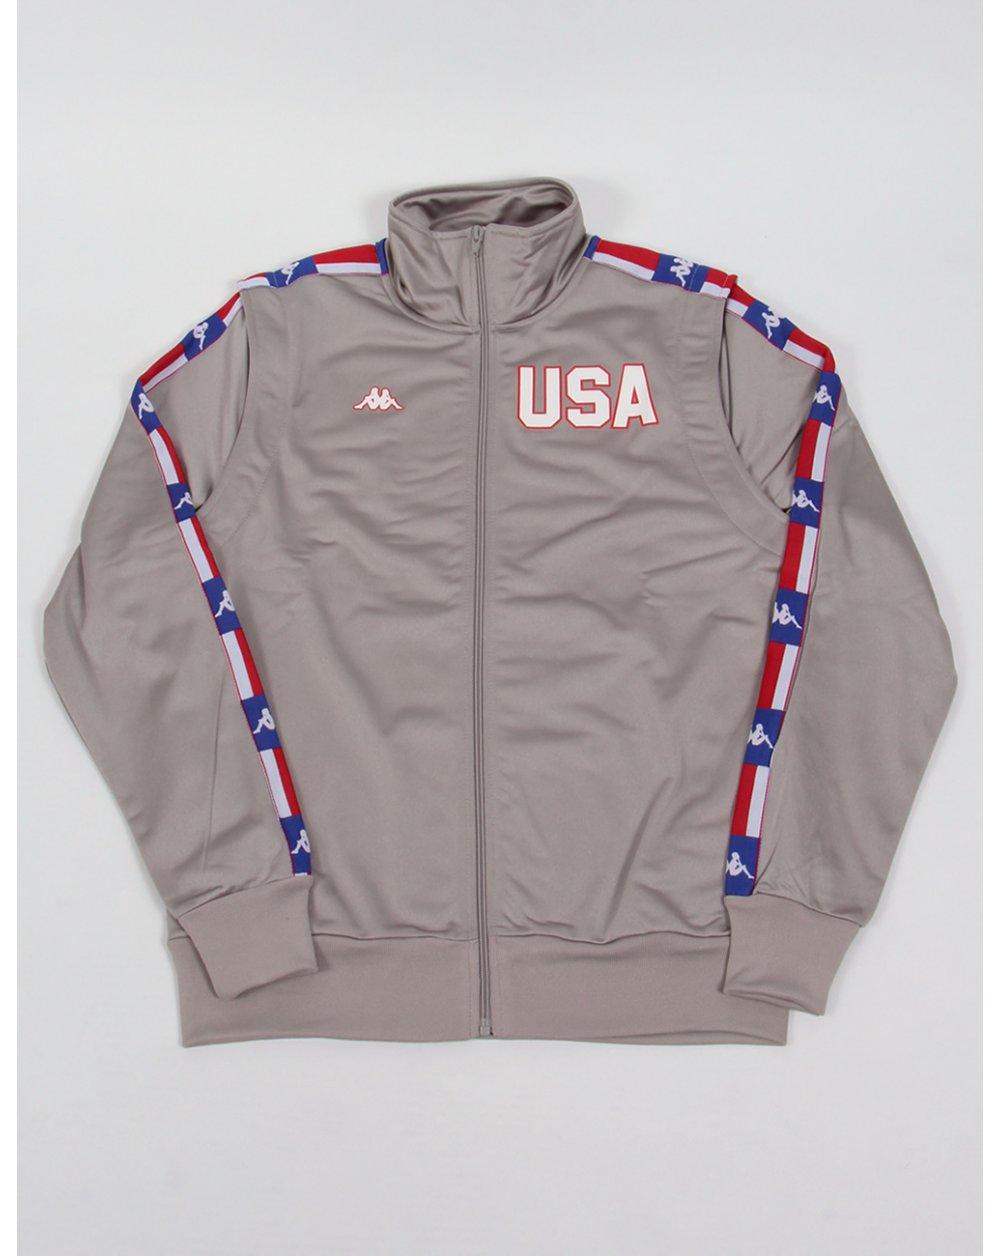 7787b89ac5 Robe Di Kappa La84 Usa Olympic Full Tracksuit Silver Grey